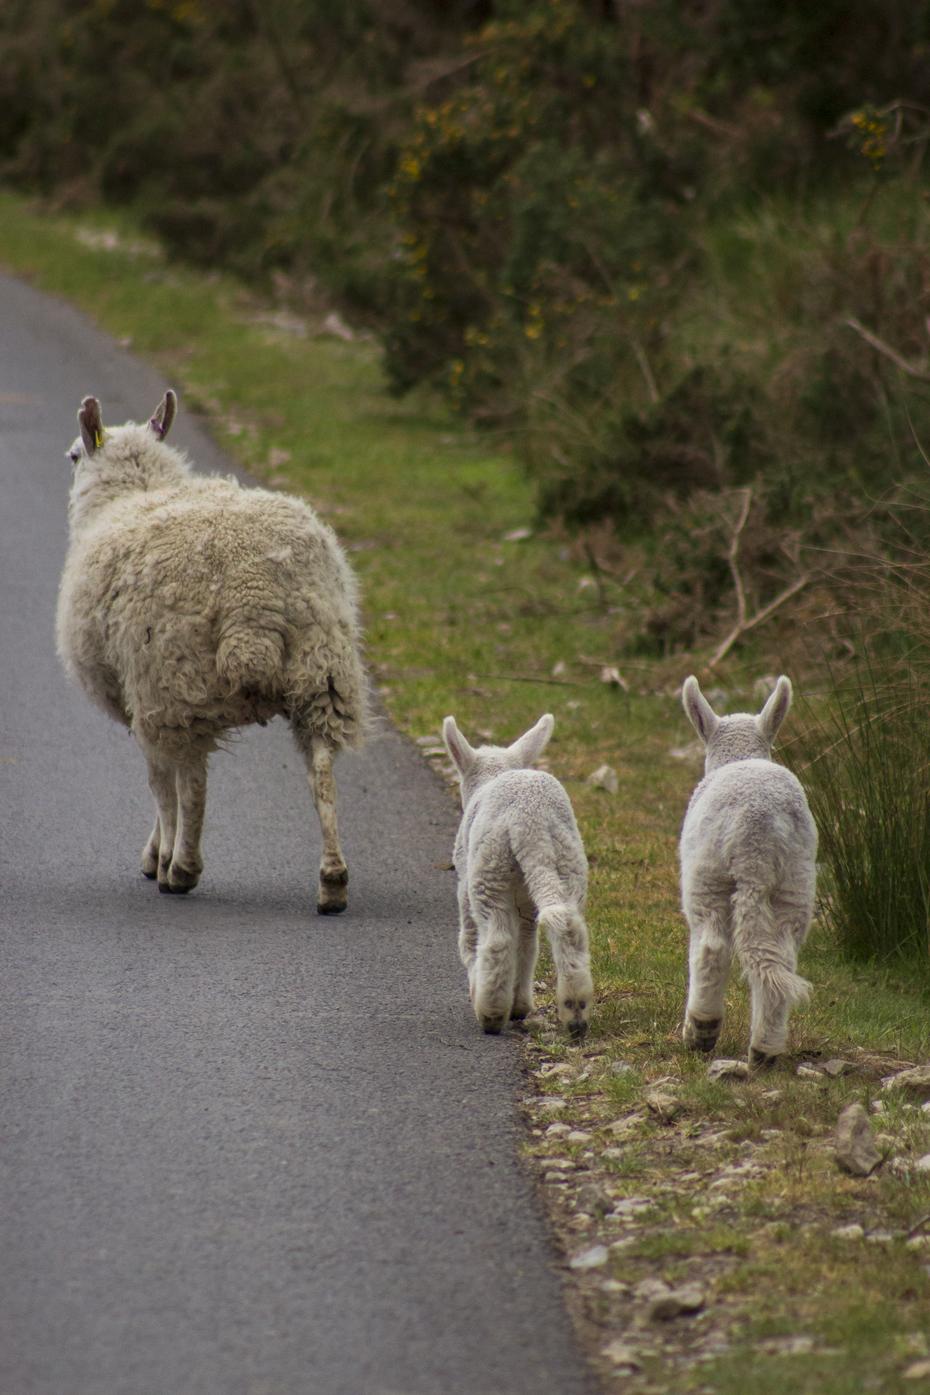 Mum and Lambs